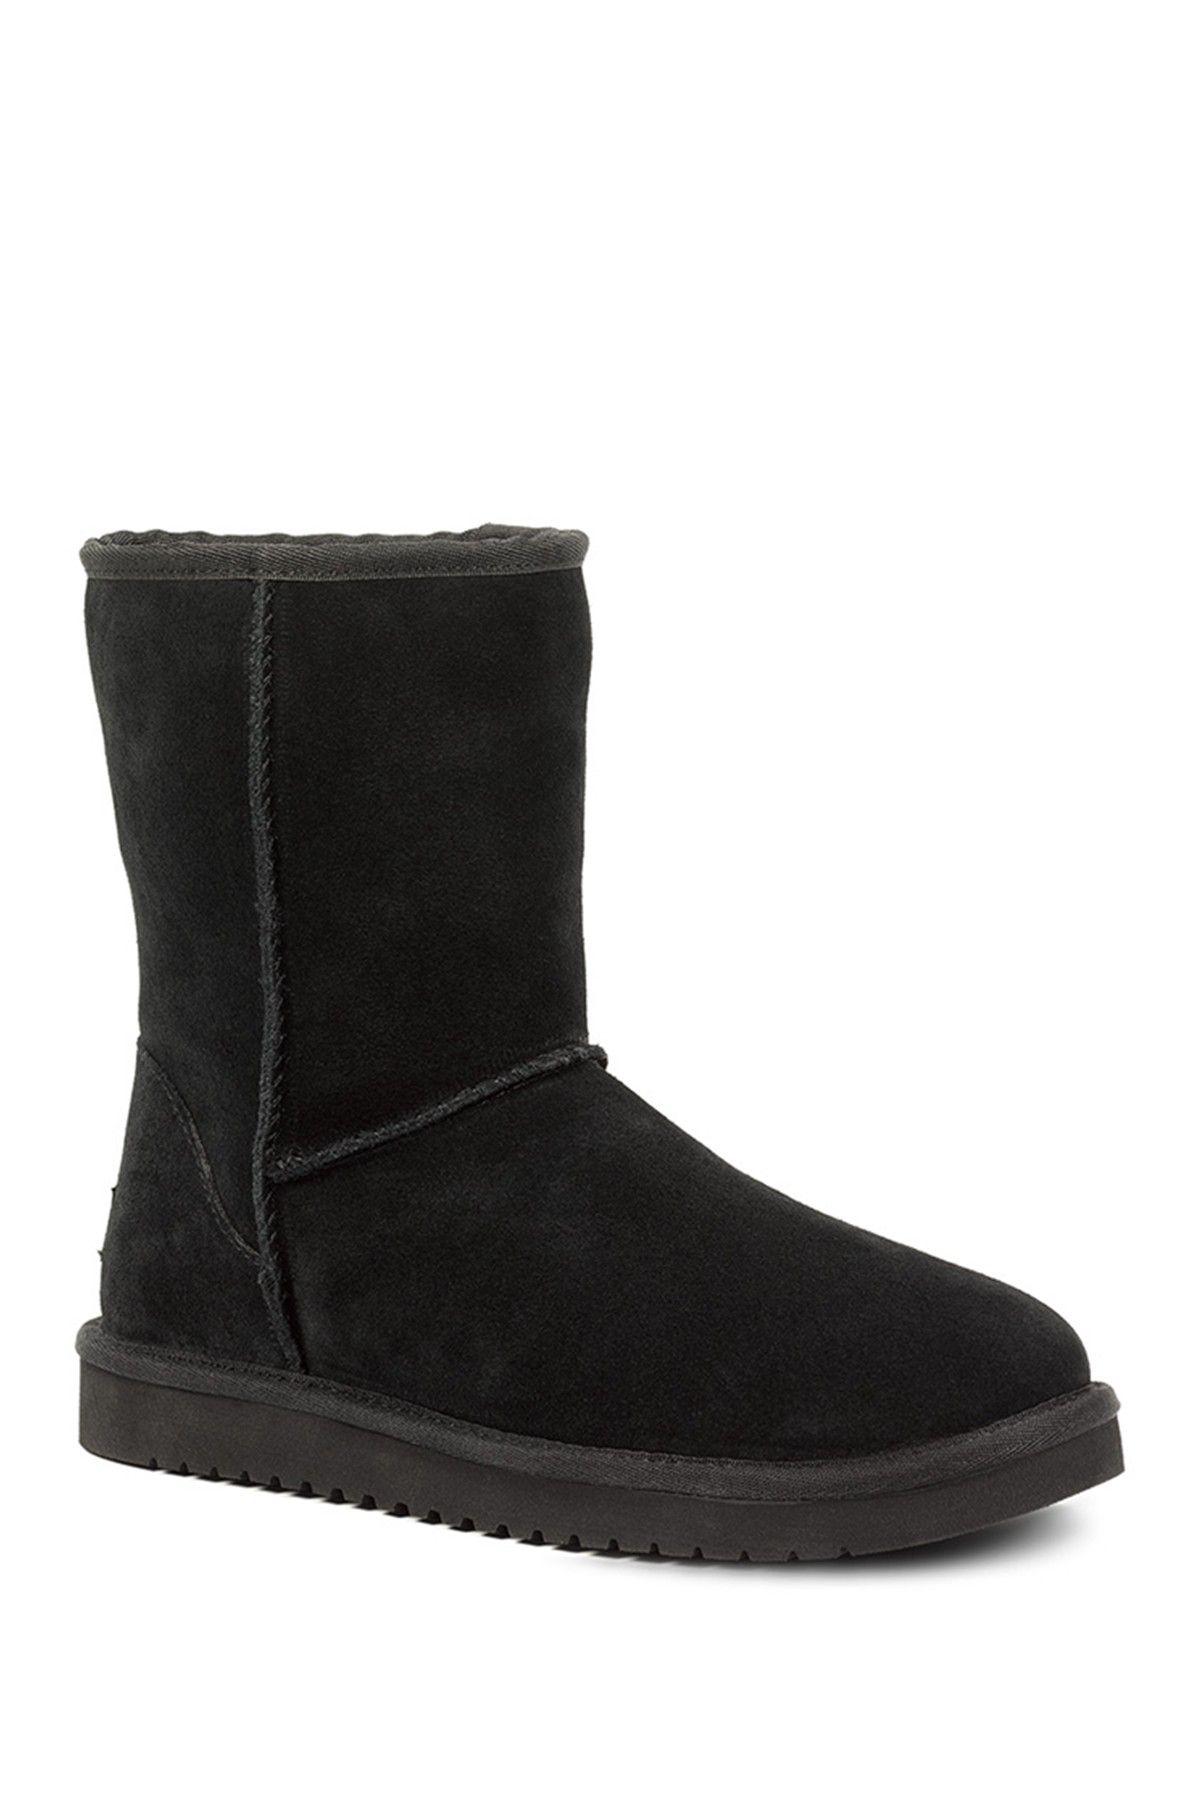 Classic Short Faux Fur Lined Boots